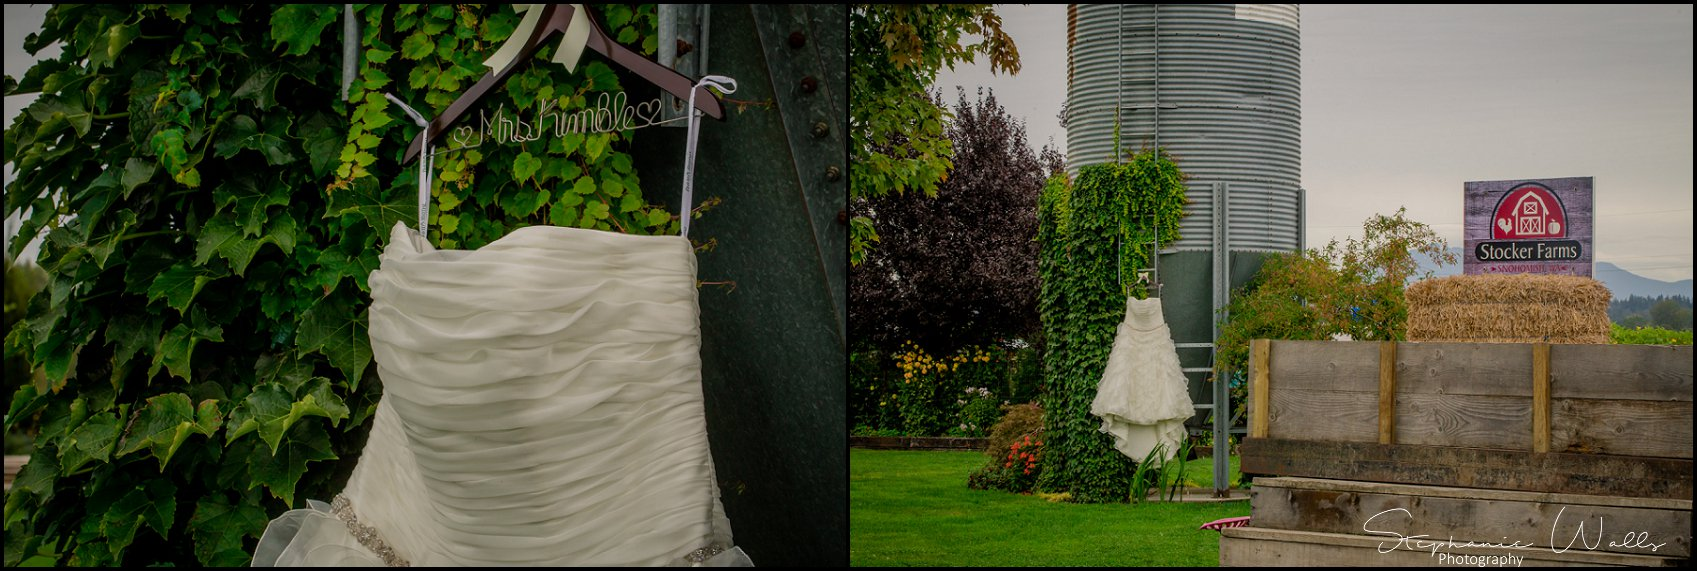 Kimble Wedding 019 Marlena & Allans | Snohomish Red Barn Events (Stocker Farms) | Snohomish, Wa Wedding Photographer